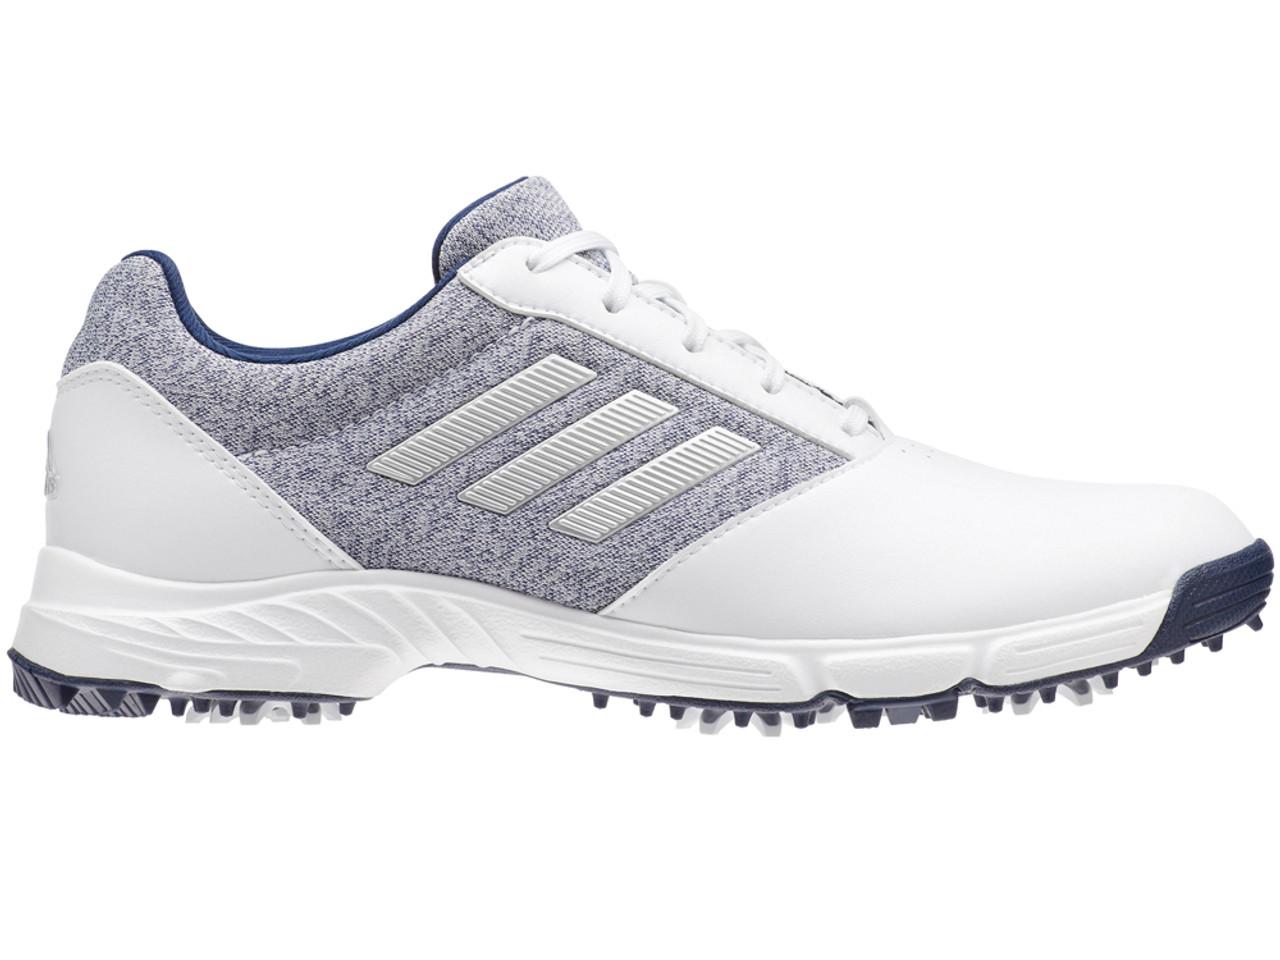 5a65ad4c43a469 Adidas W Tech Response Golf Shoes - FTWR White/Night Indigo - Ladies ...